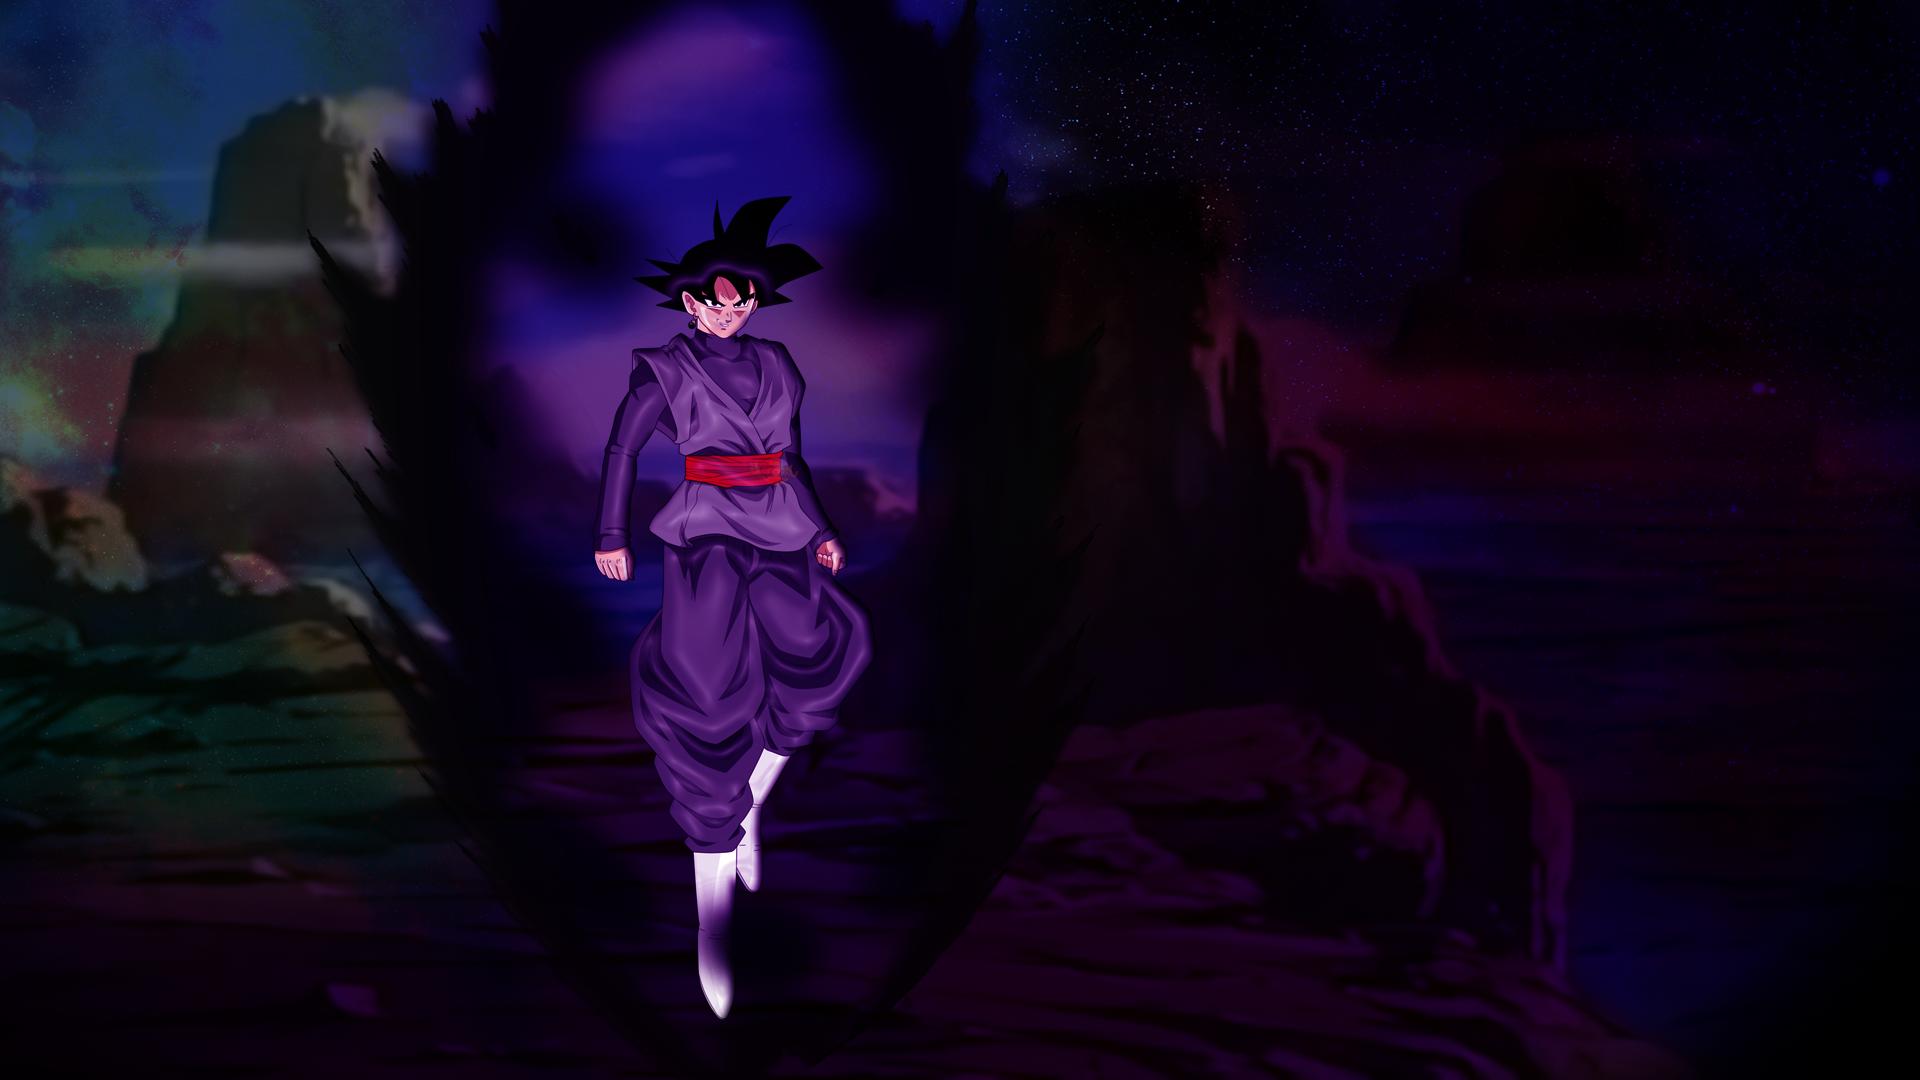 Black Goku Wallpaper By Zen Aku1 On Deviantart